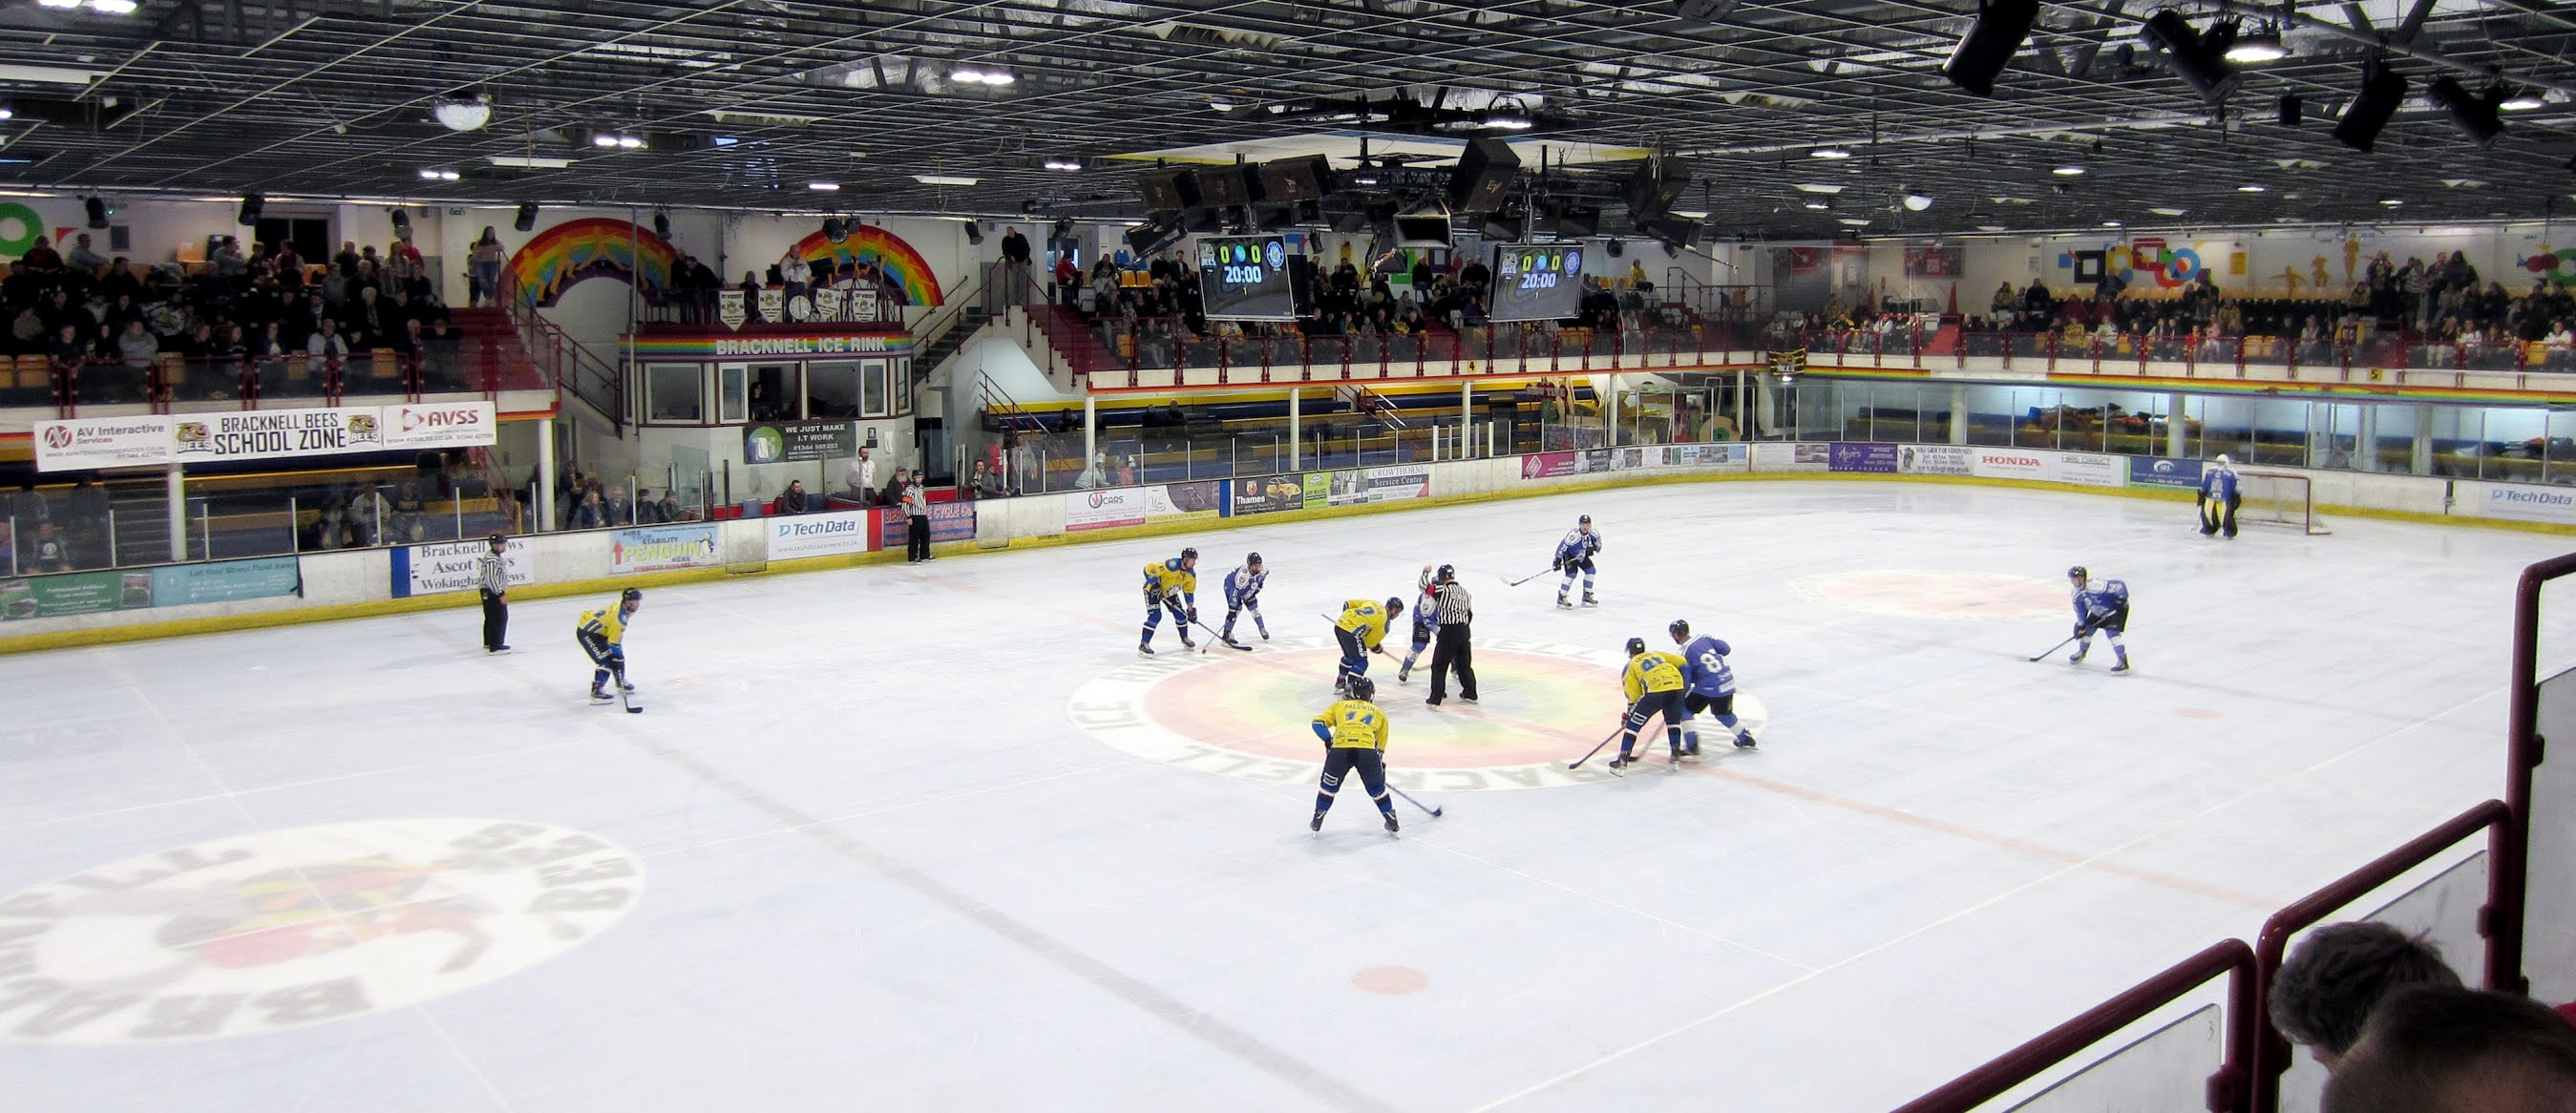 Ice hockey at the Bracknell Ice Rink